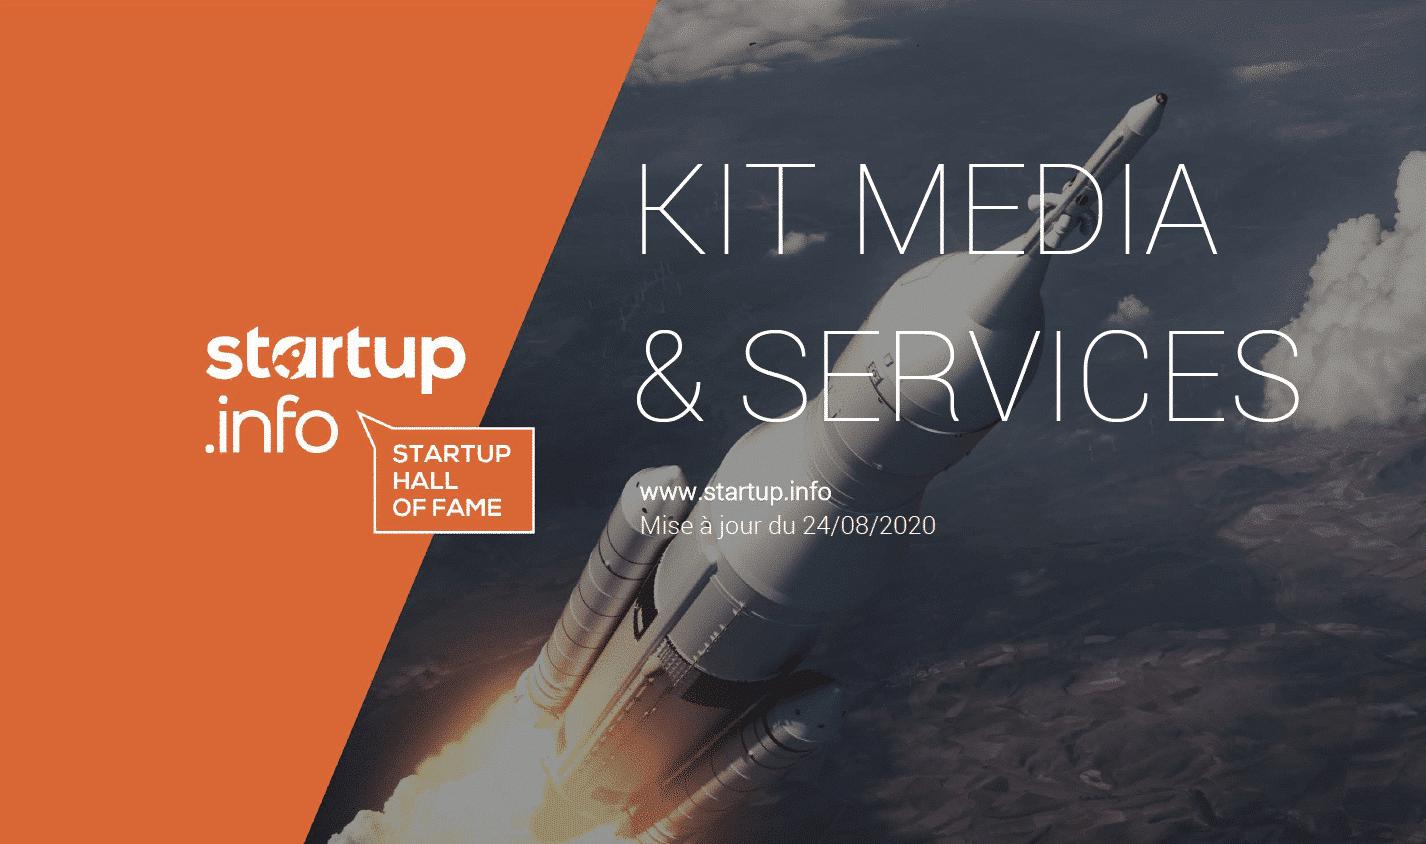 kit media startups